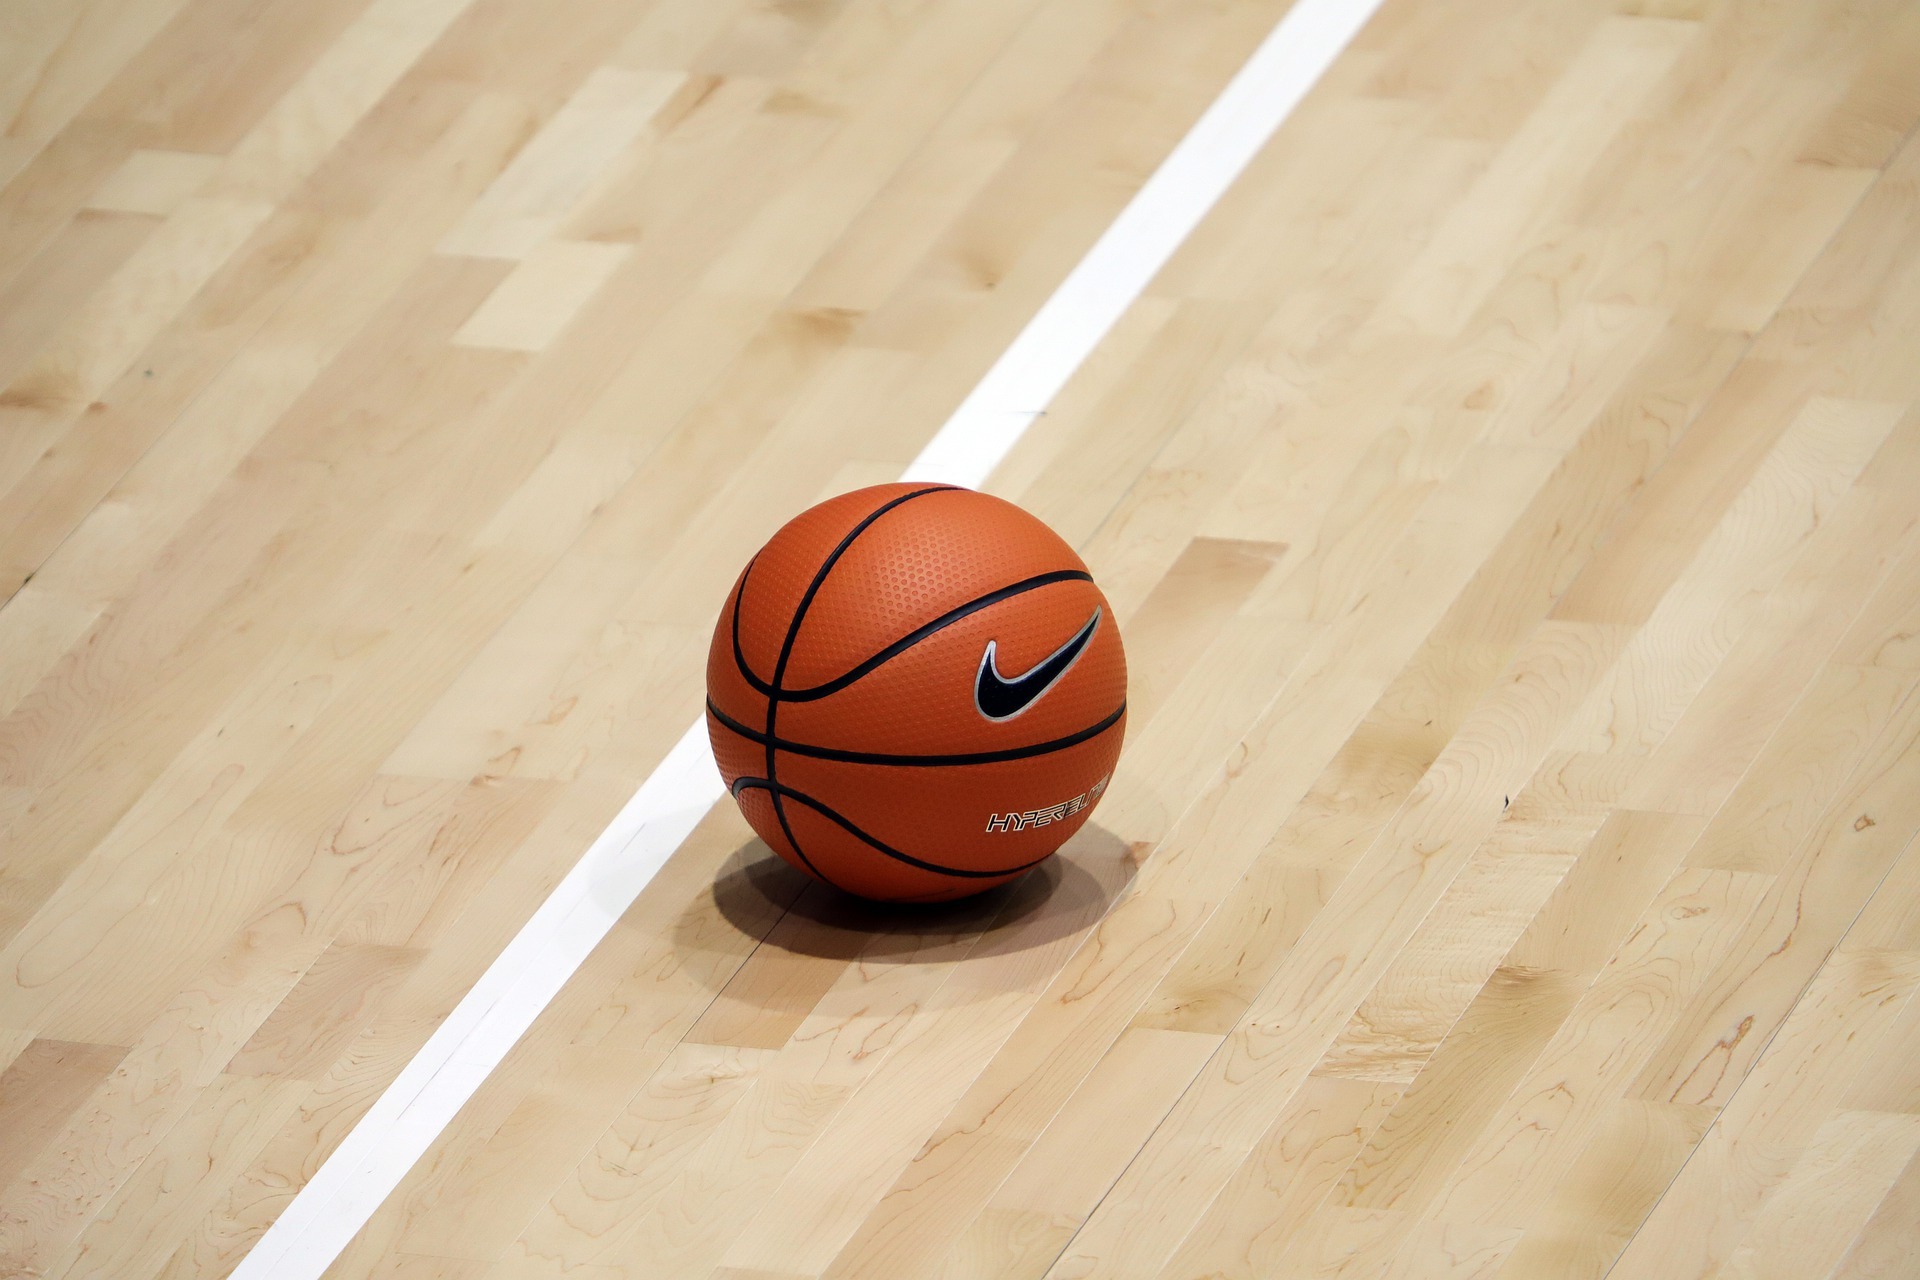 Infortuni pallacanestro